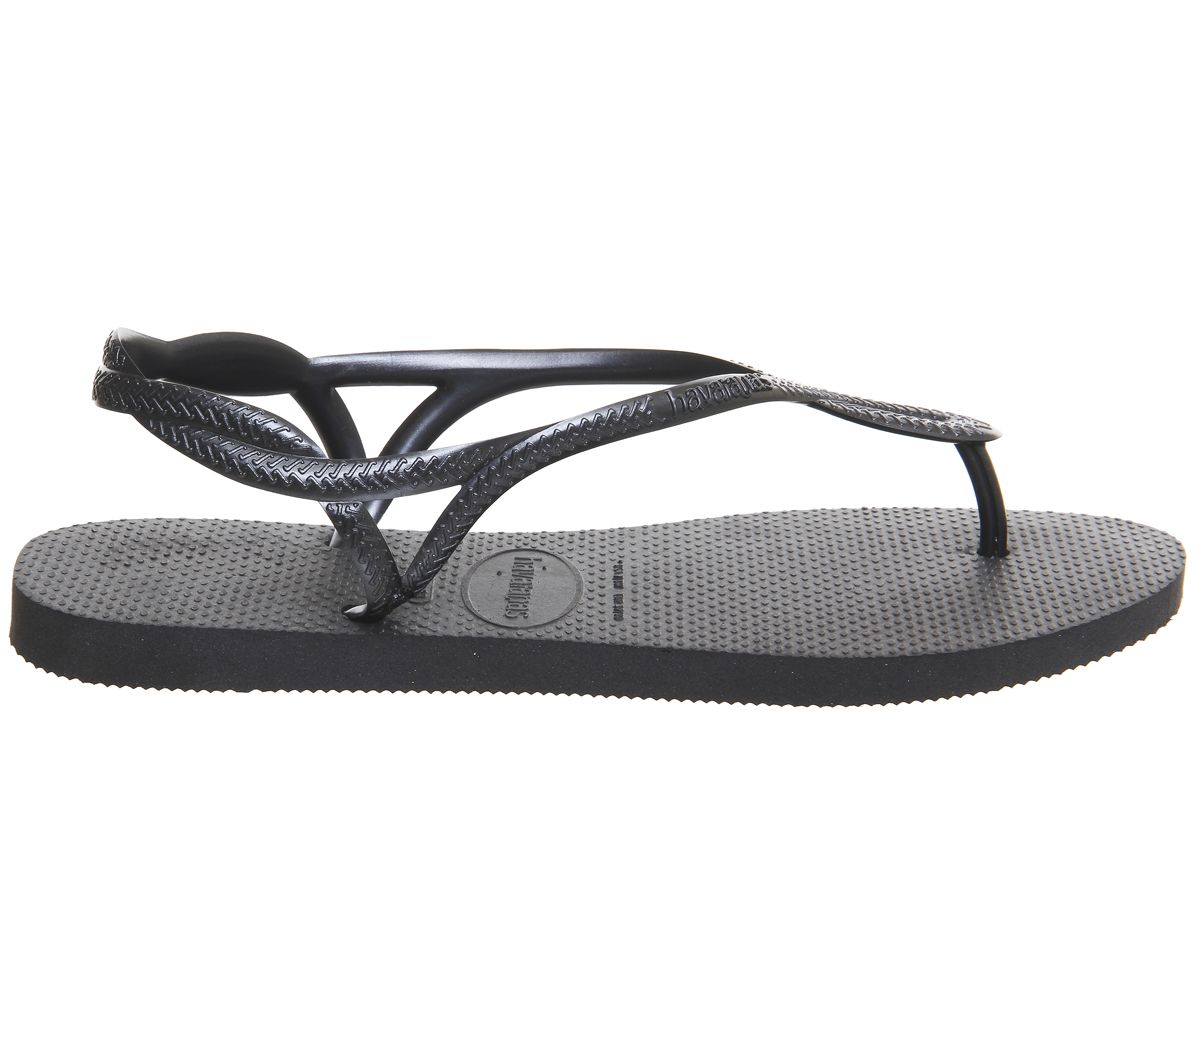 f295e1d83 Womens-Havaianas-Luna-Flip-Flops-Black-Sandals thumbnail 17